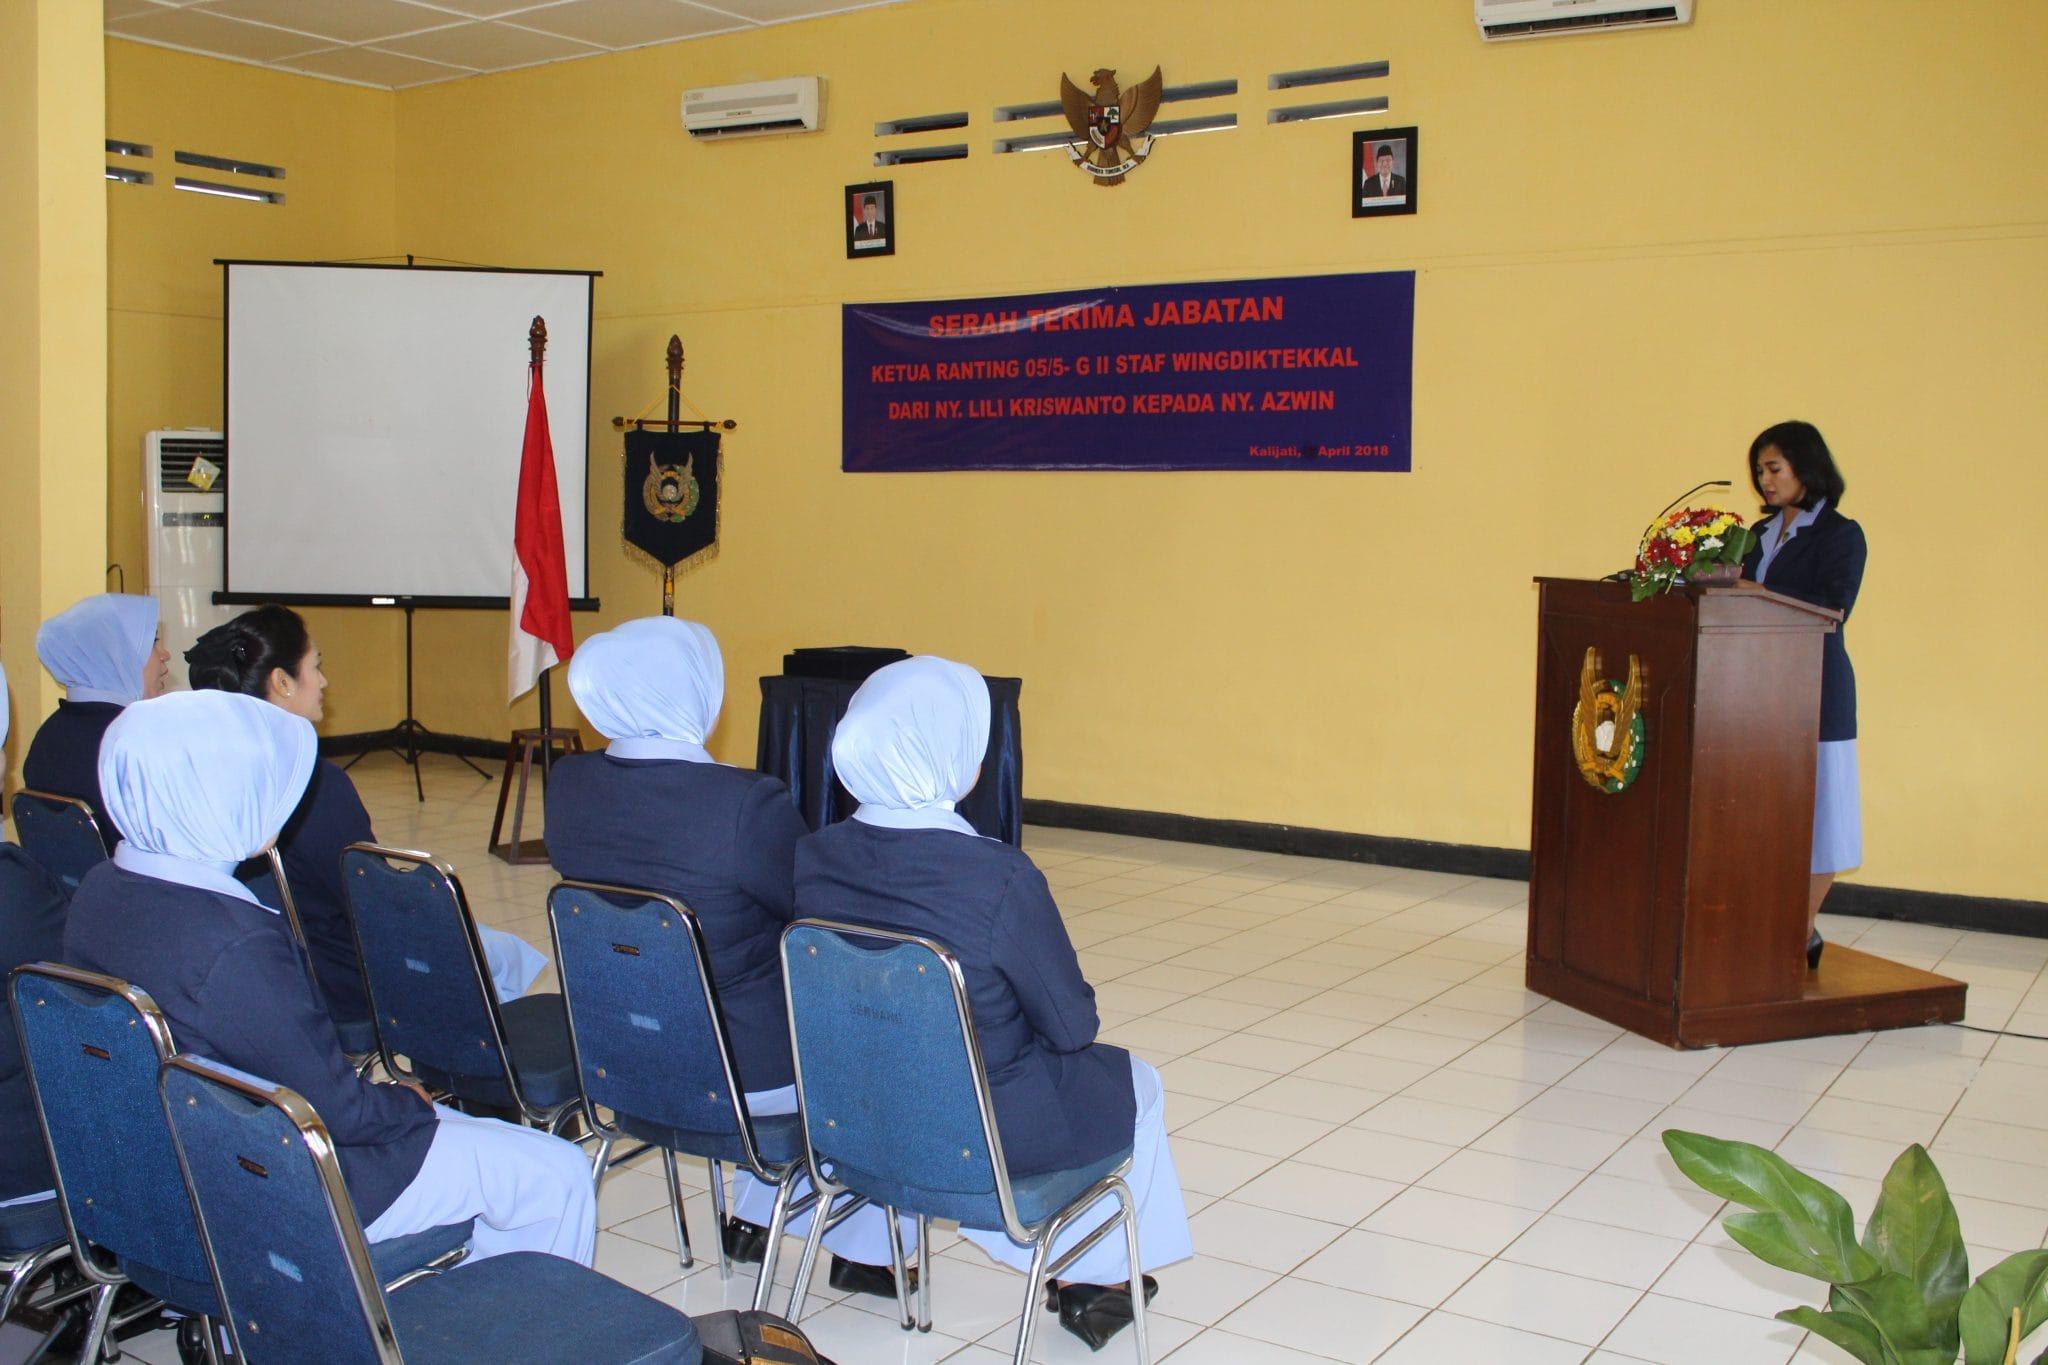 Ny. Nining Suryadi Pimpin Sertijab Ketua PIA AG Wingdiktekkal Kalijati